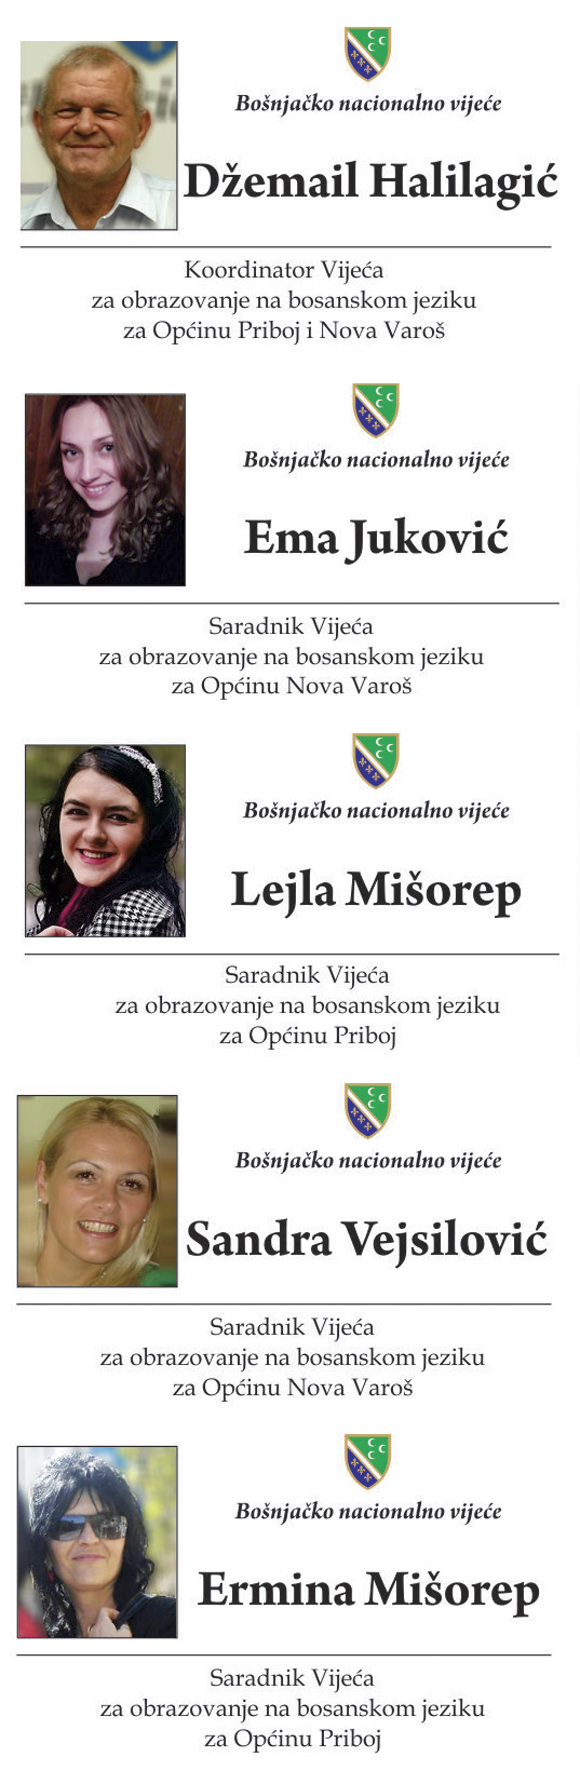 Legitimacije saradnici Priboj Nova Varos